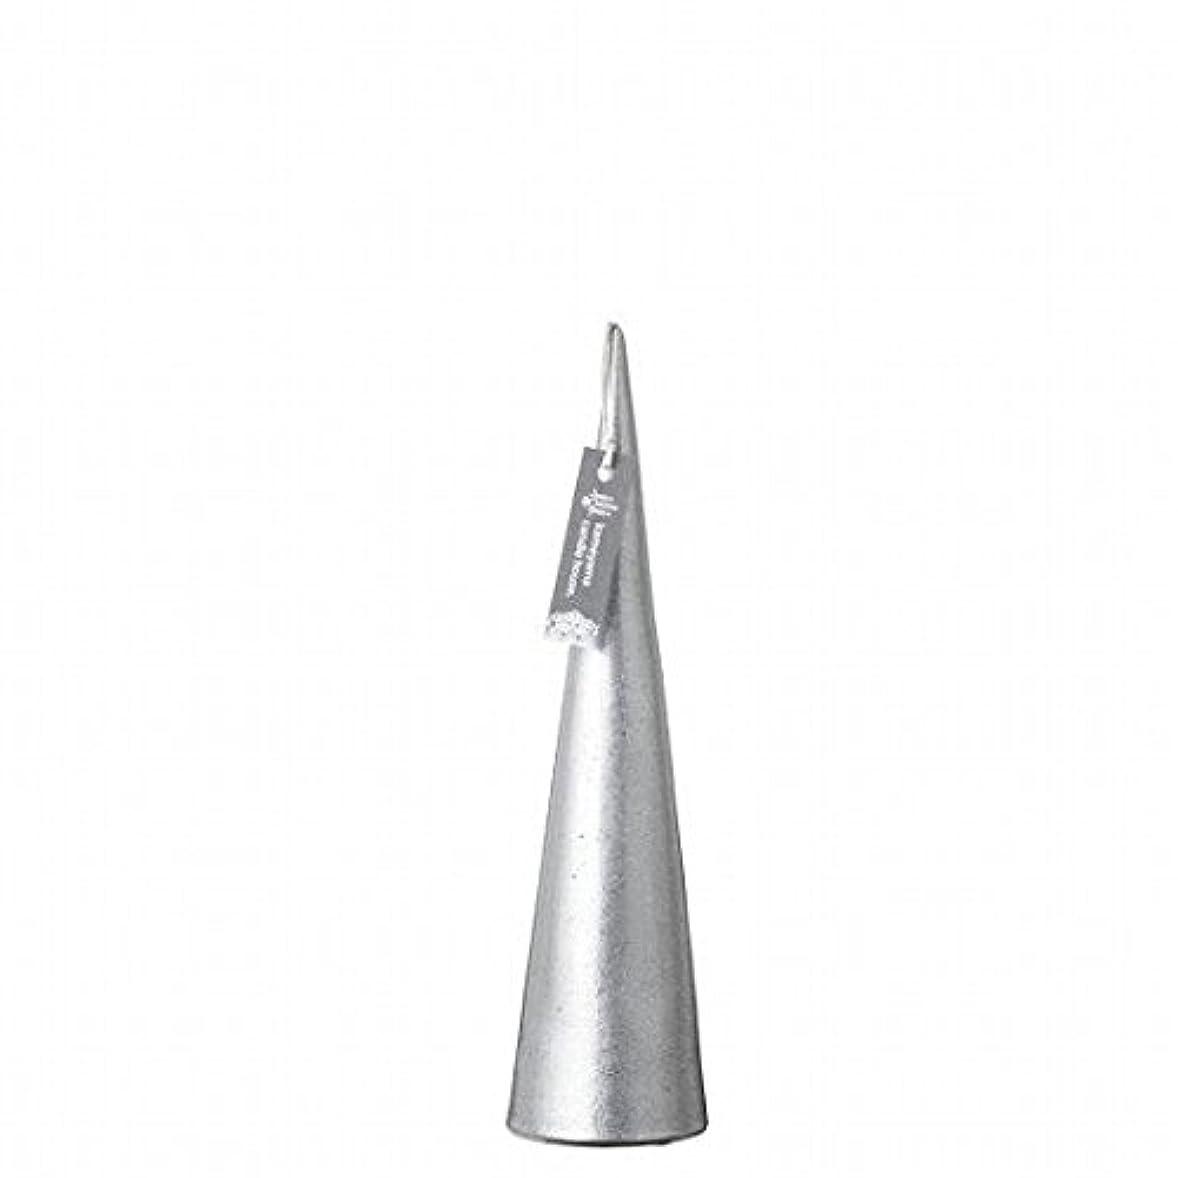 kameyama candle(カメヤマキャンドル) メタリックコーンM 「 シルバー 」(A9560110SI)